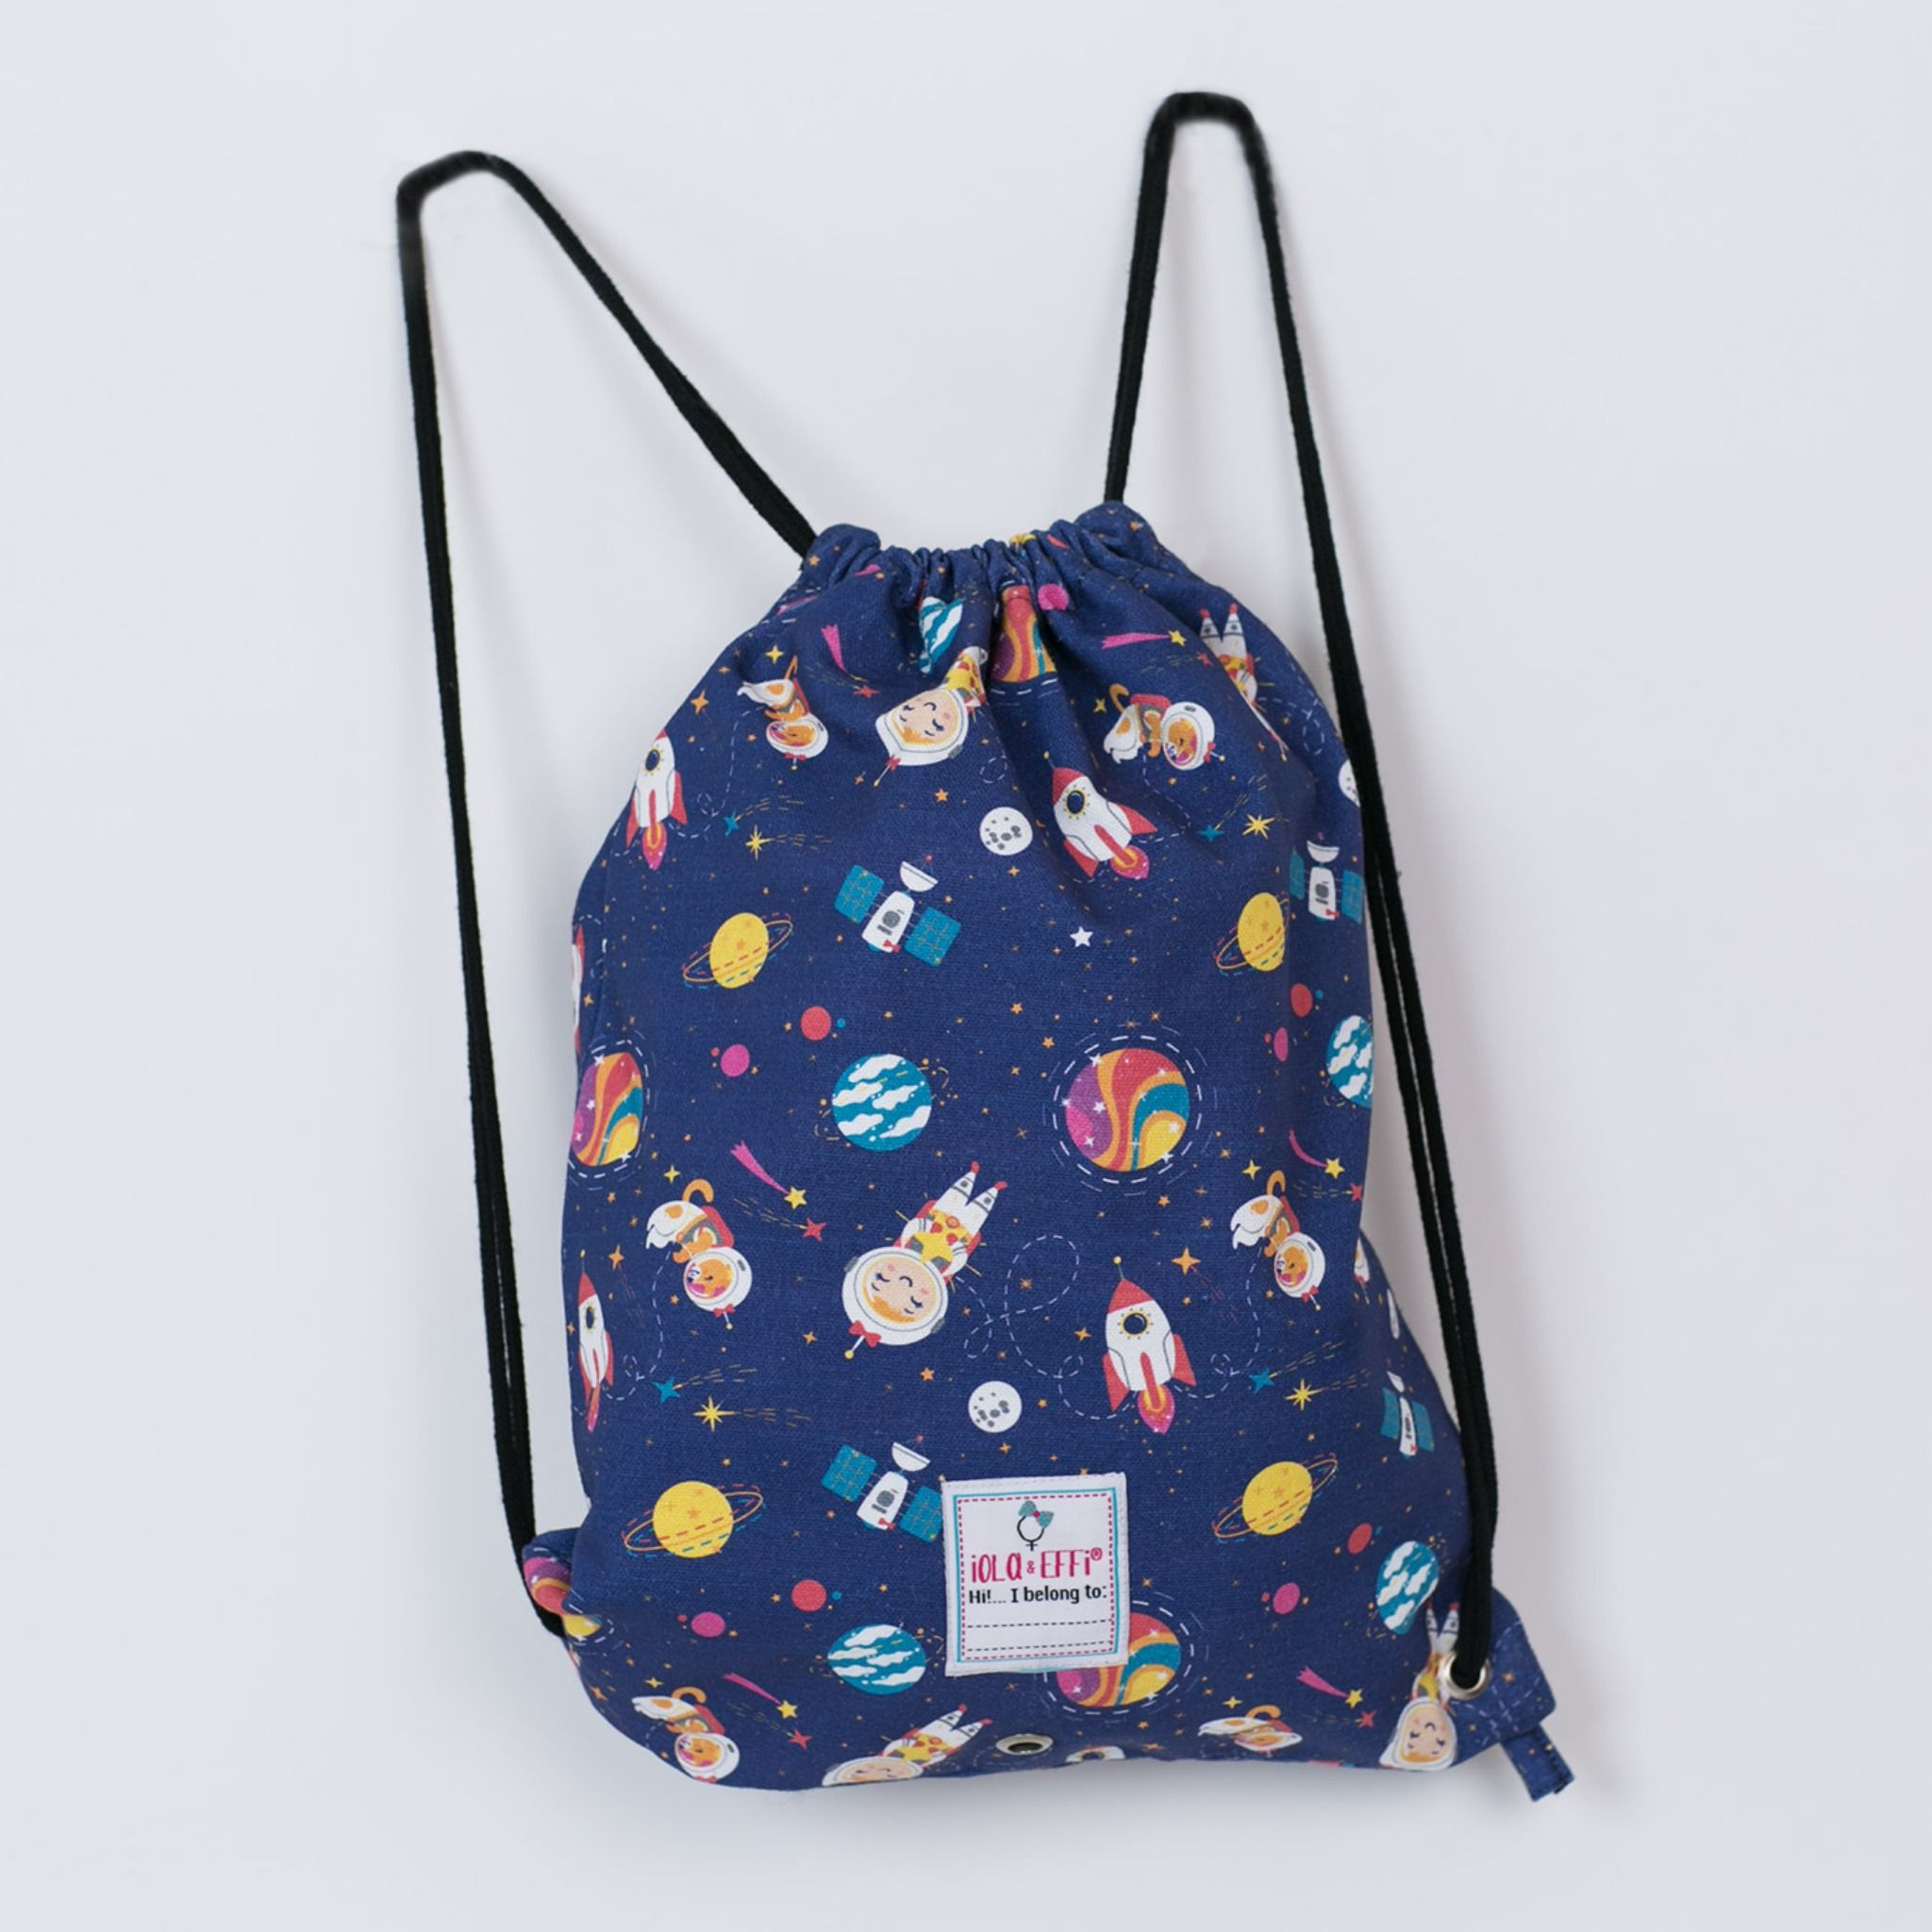 e163bdb8a5e66 Every space explorer needs to carry the survival kit bag for their ...